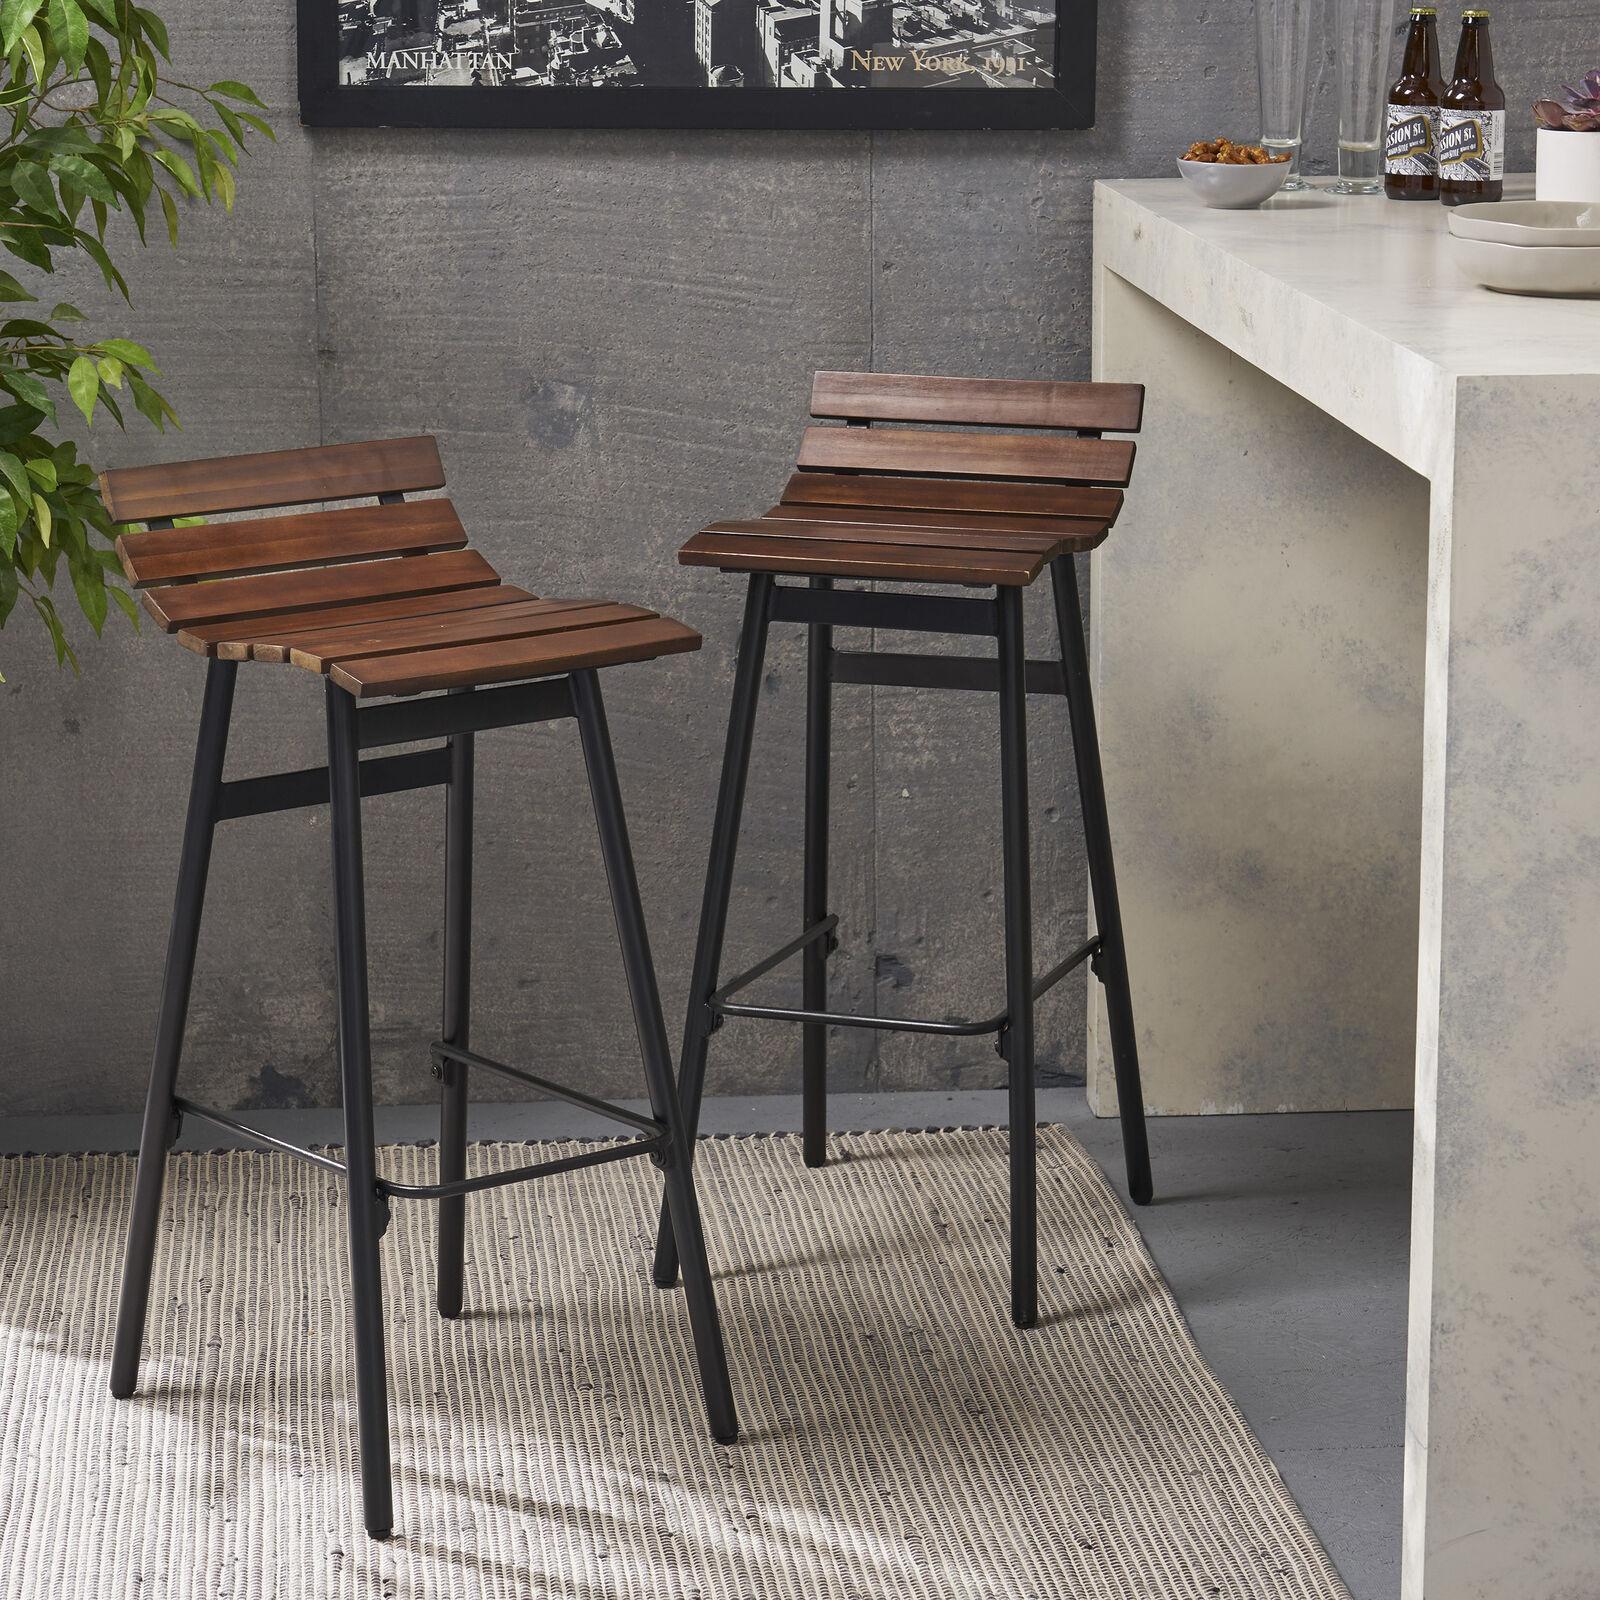 Camron 35″ Wooden Barstool (Set of 2) Benches, Stools & Bar Stools